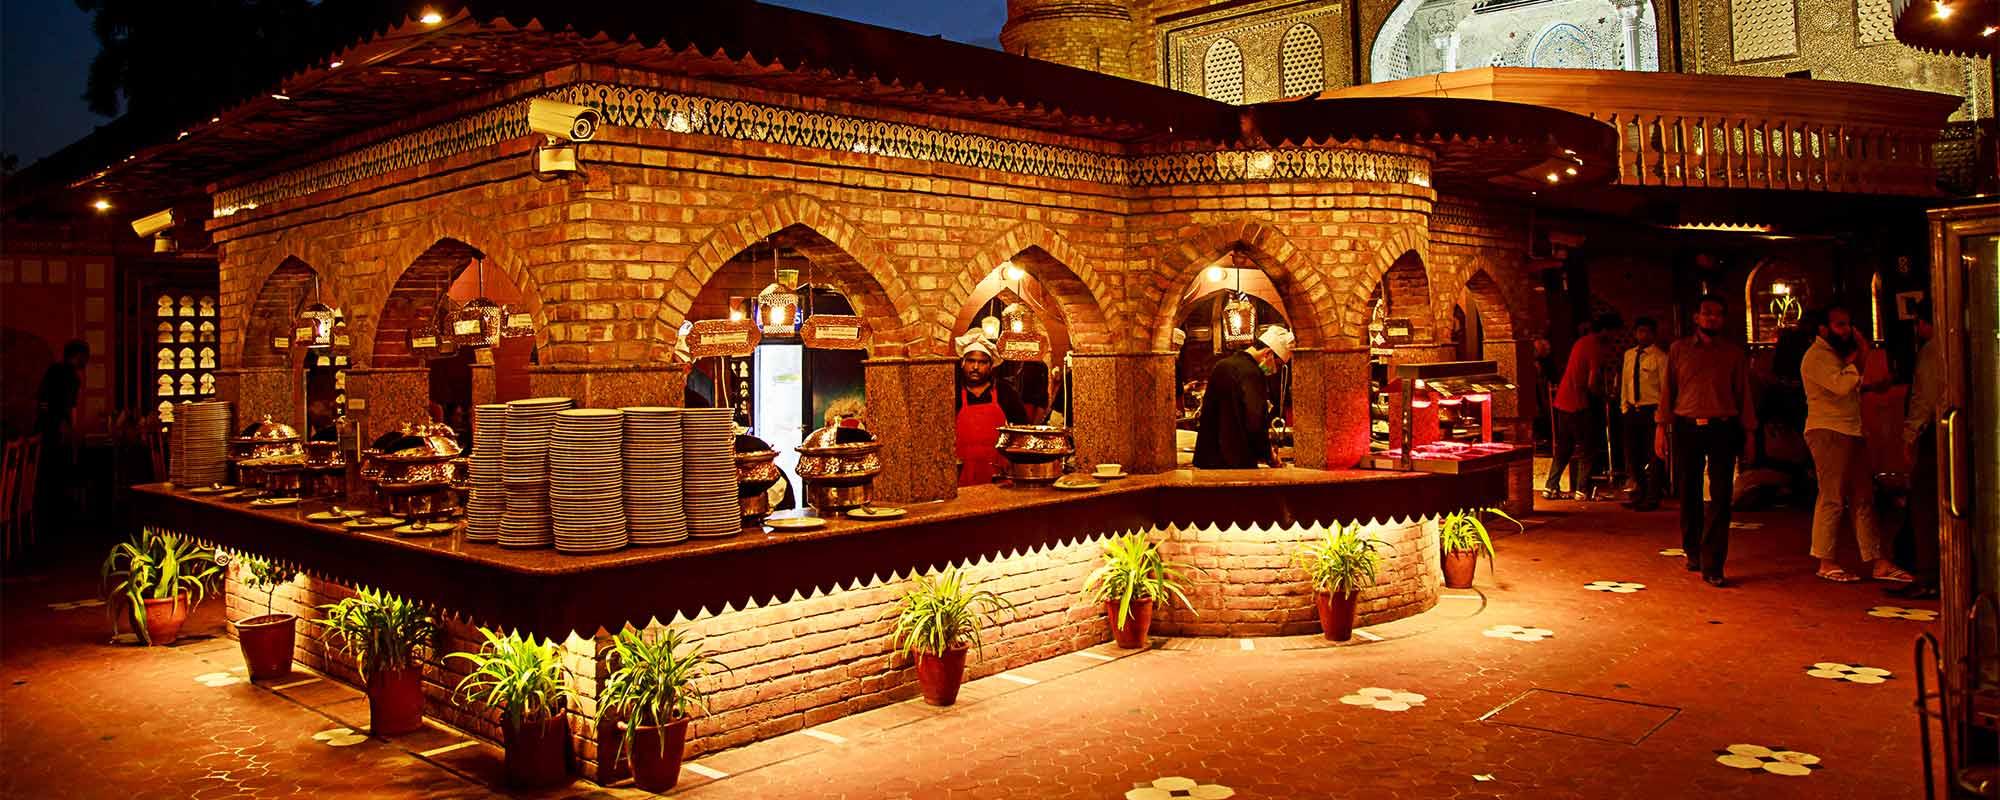 Lalqila Karachi, Main Buffet Counter